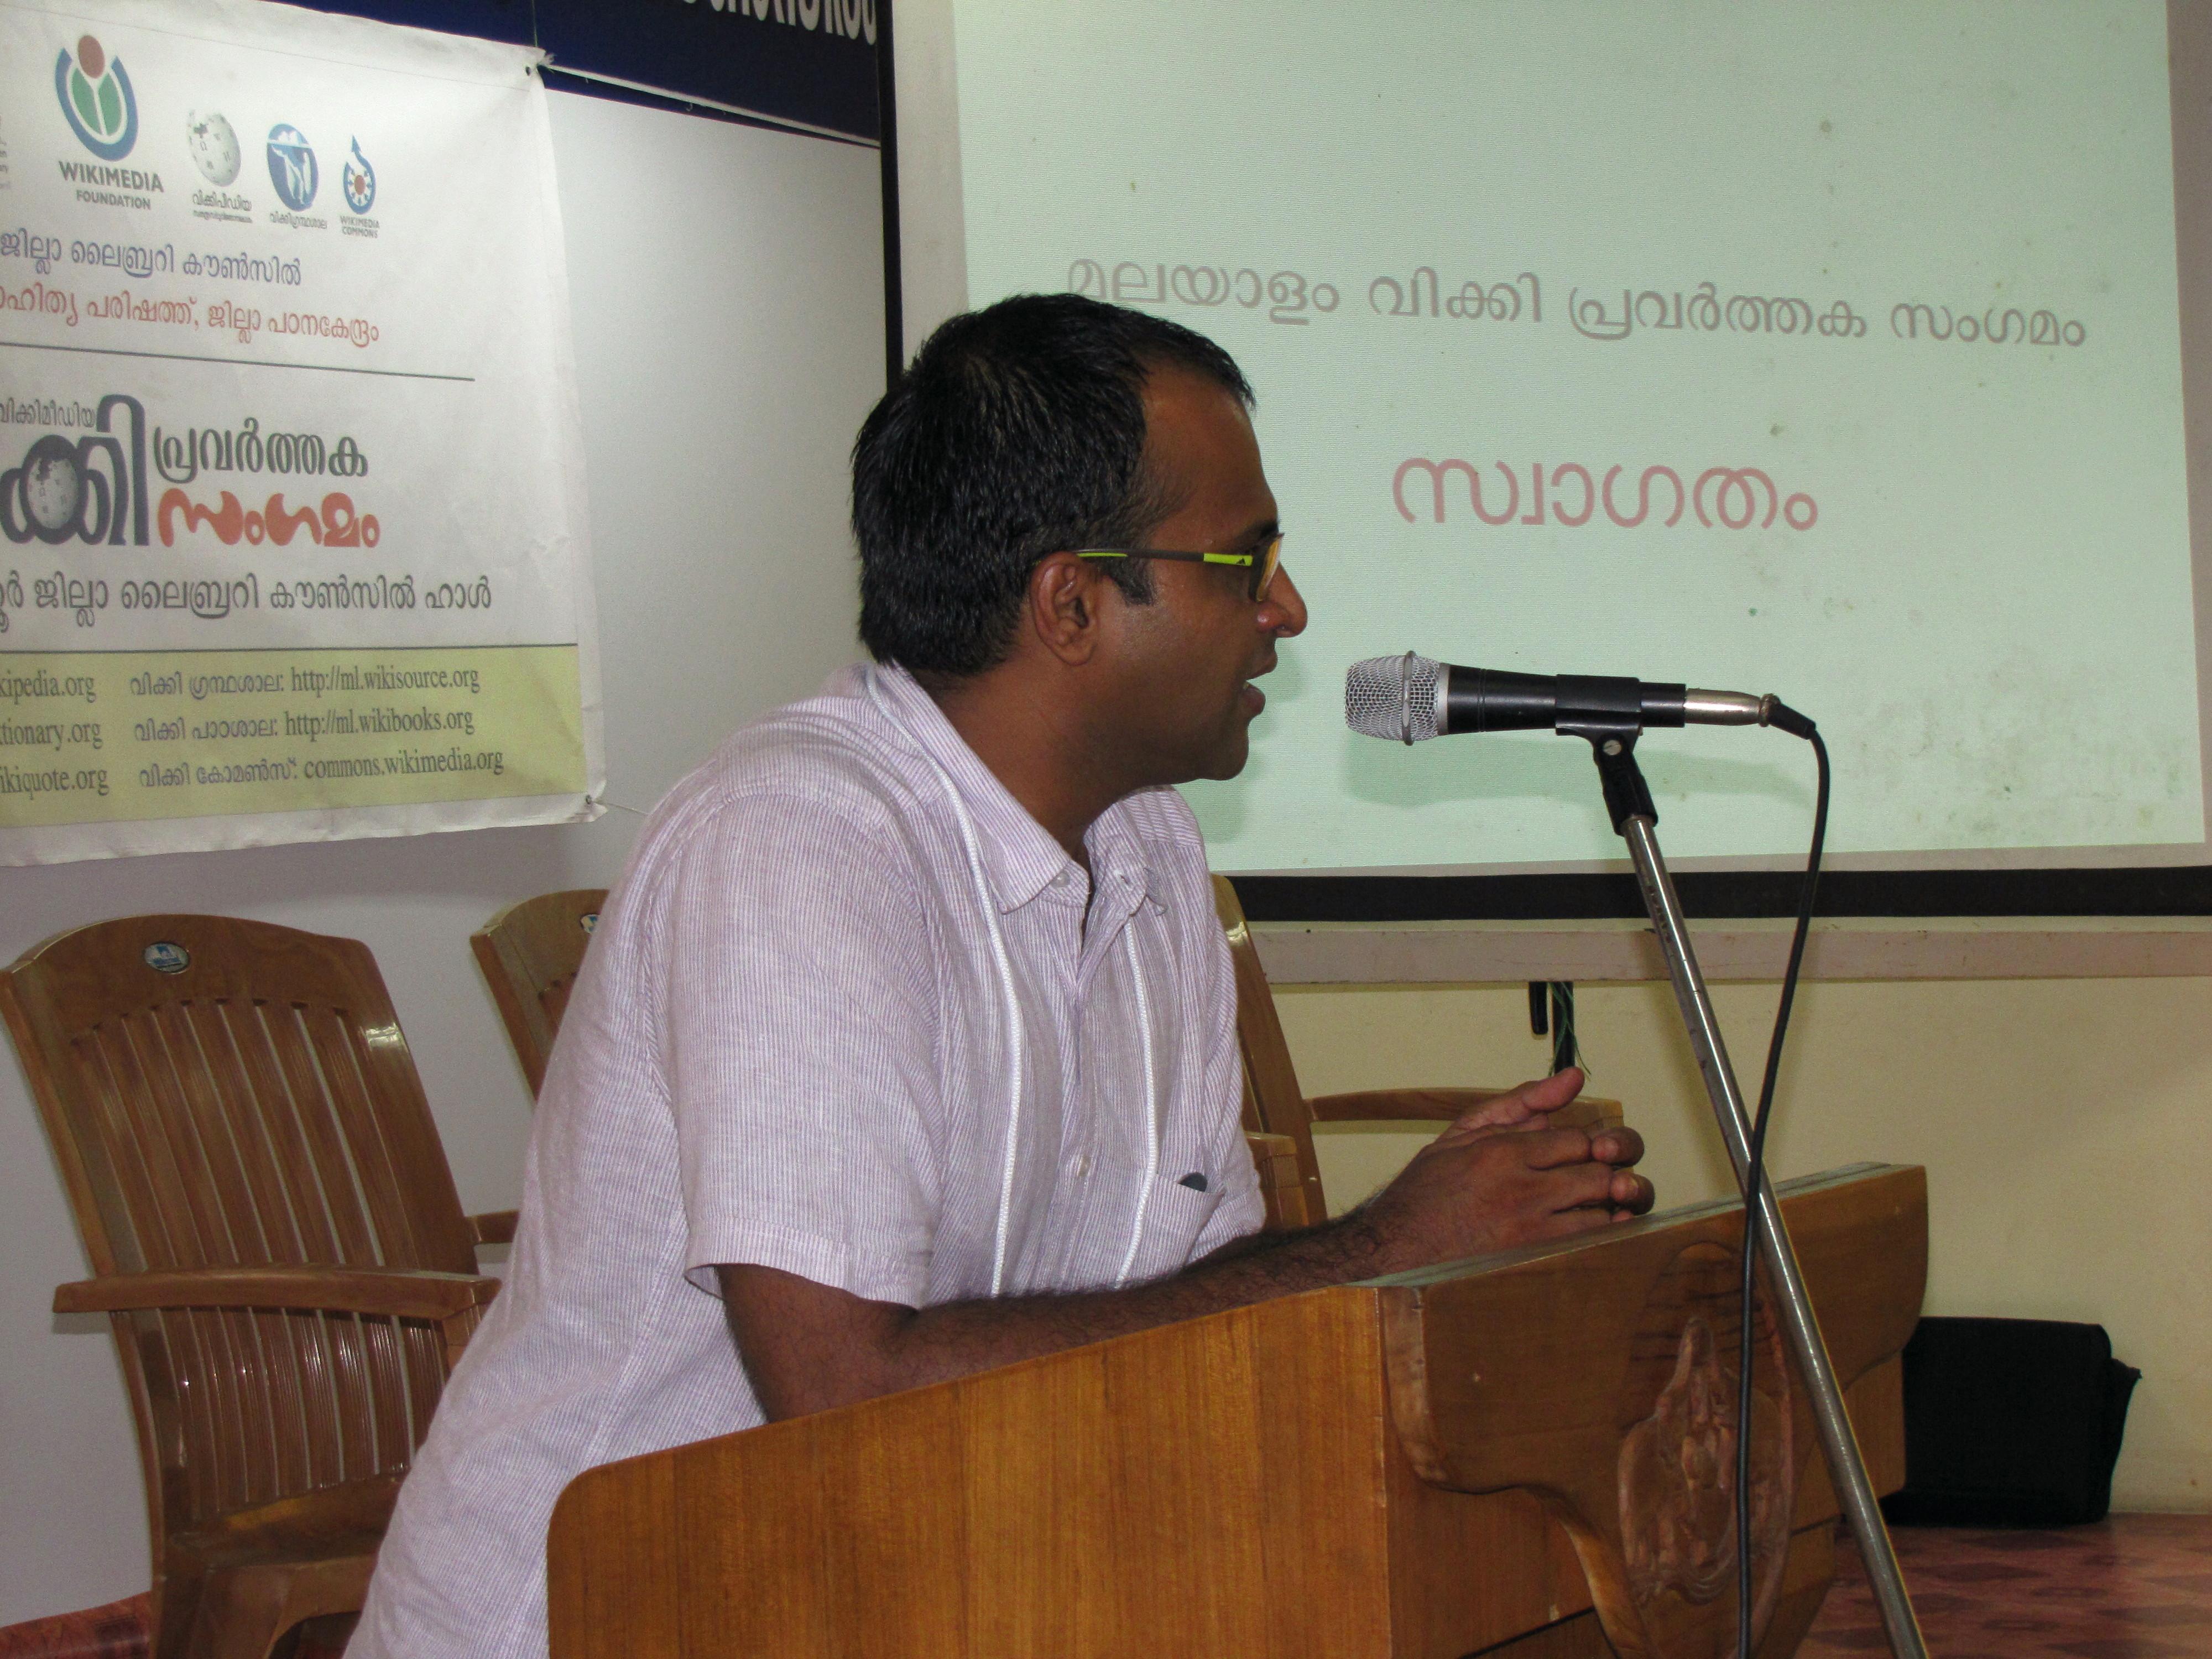 File:Hisham-mundol-speech-on-wiki-meet-up.jpg - Wikimedia Commons